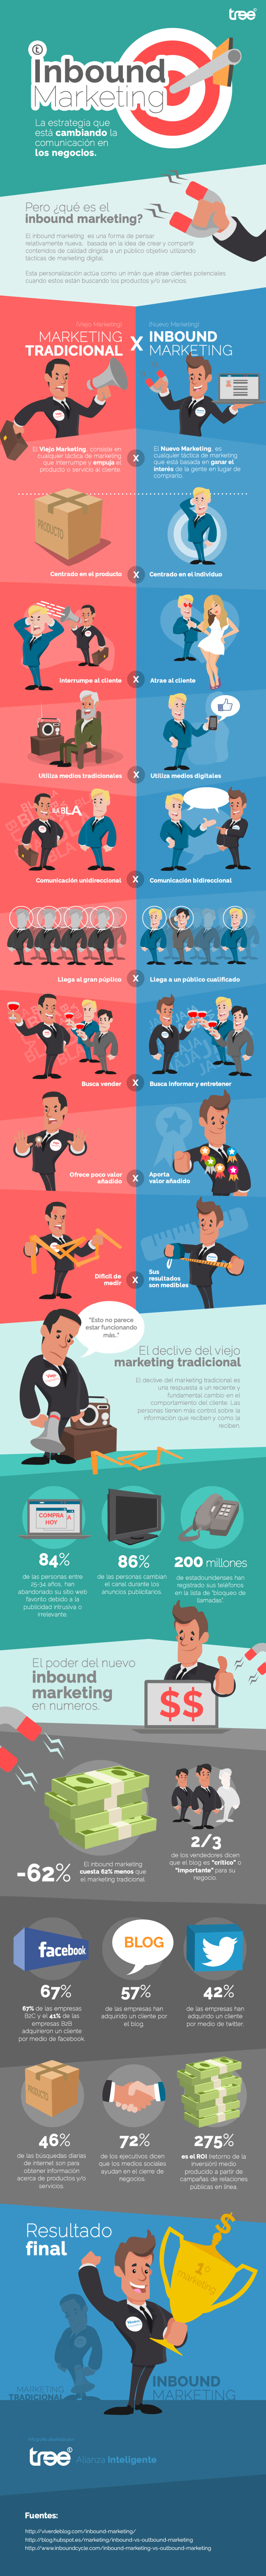 Inbound Marketing vs Marketing tradicional #infografia #infographic #marketing